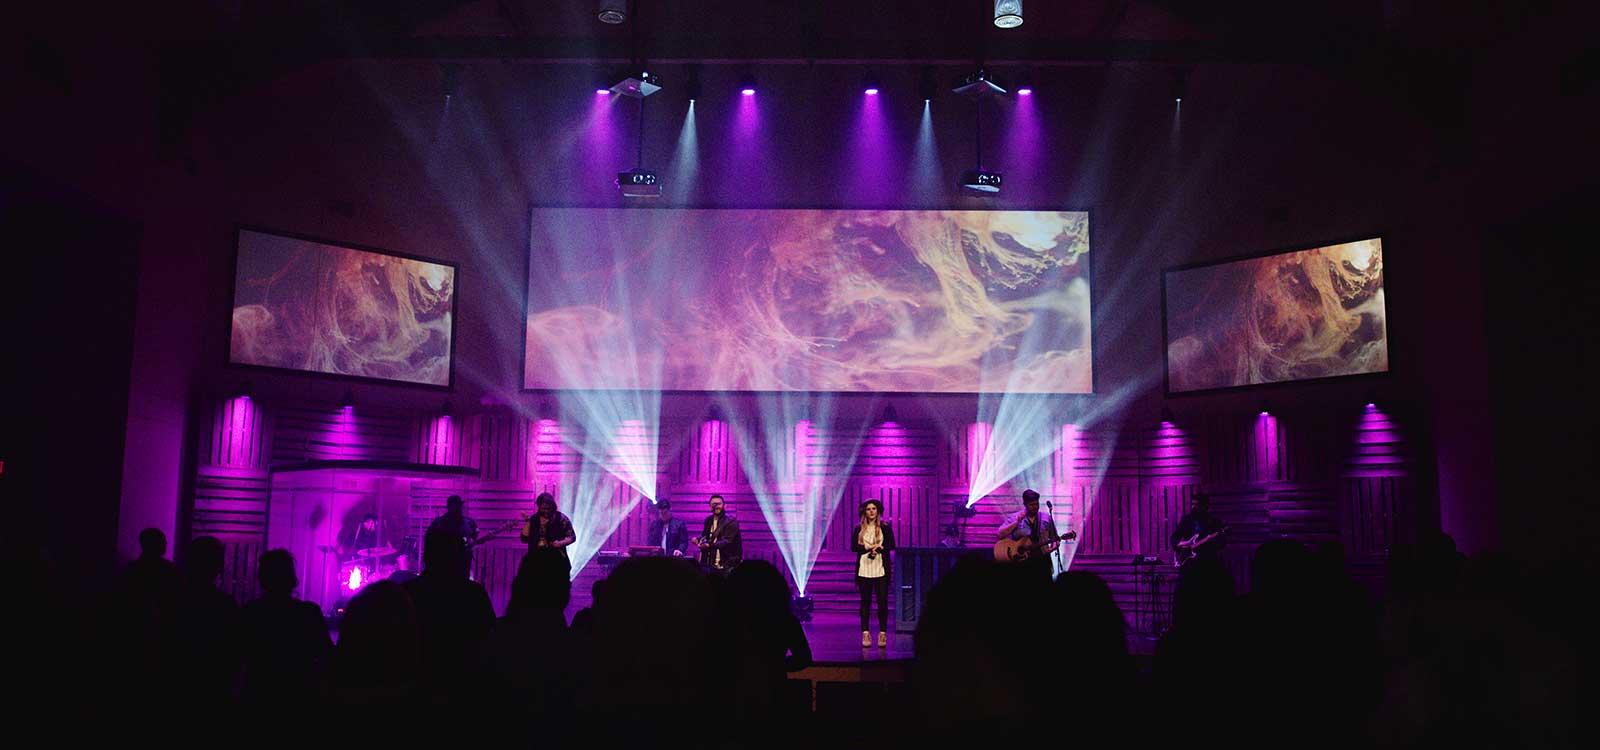 Celebrate women - women's ministry in The Woodlands